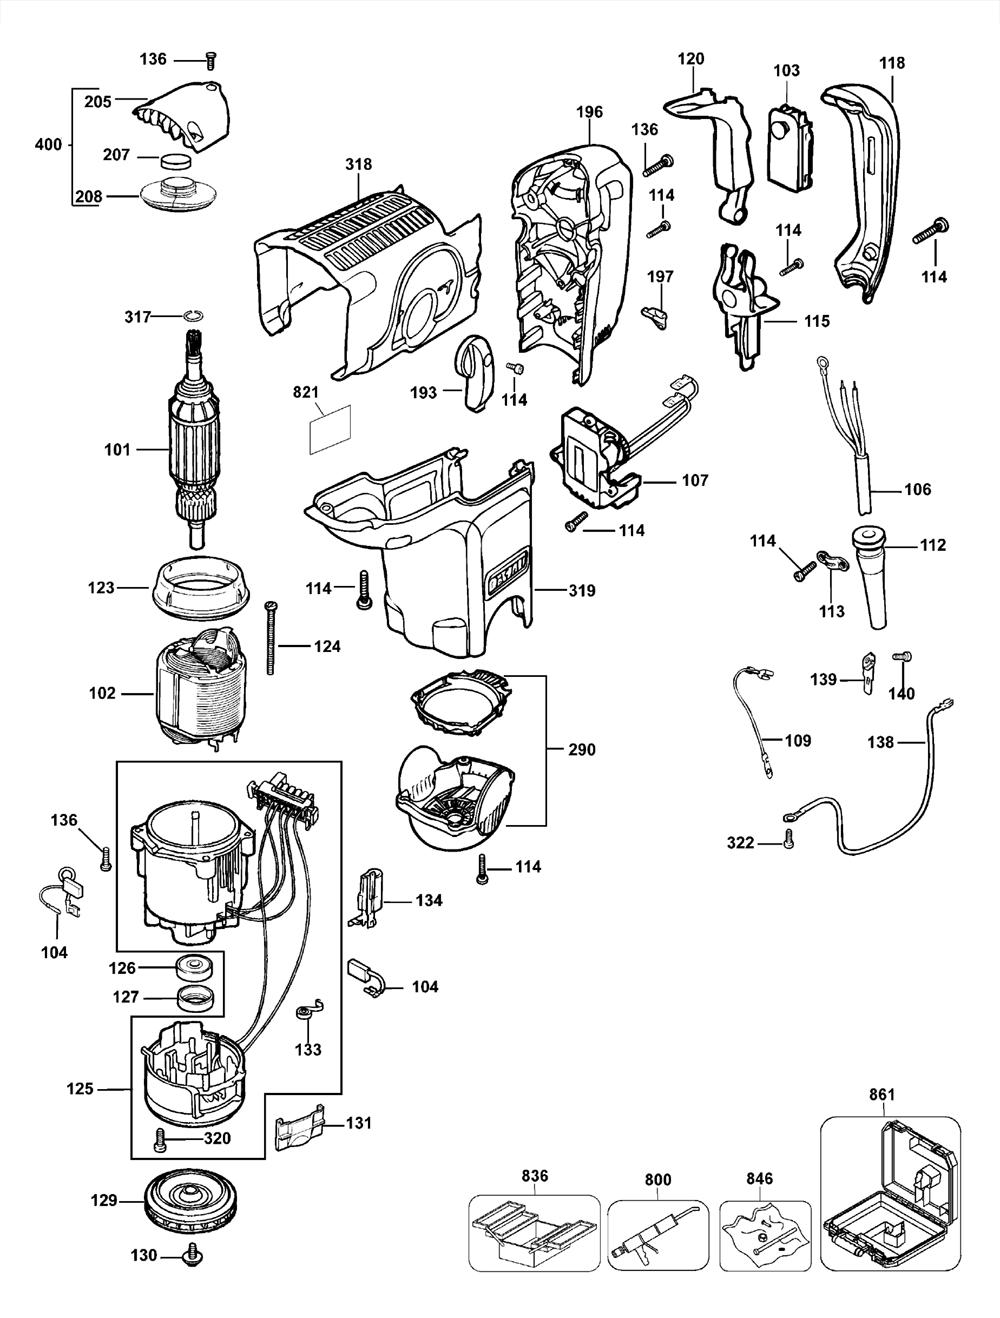 D25600K-T3-Dewalt-PB-1Break Down